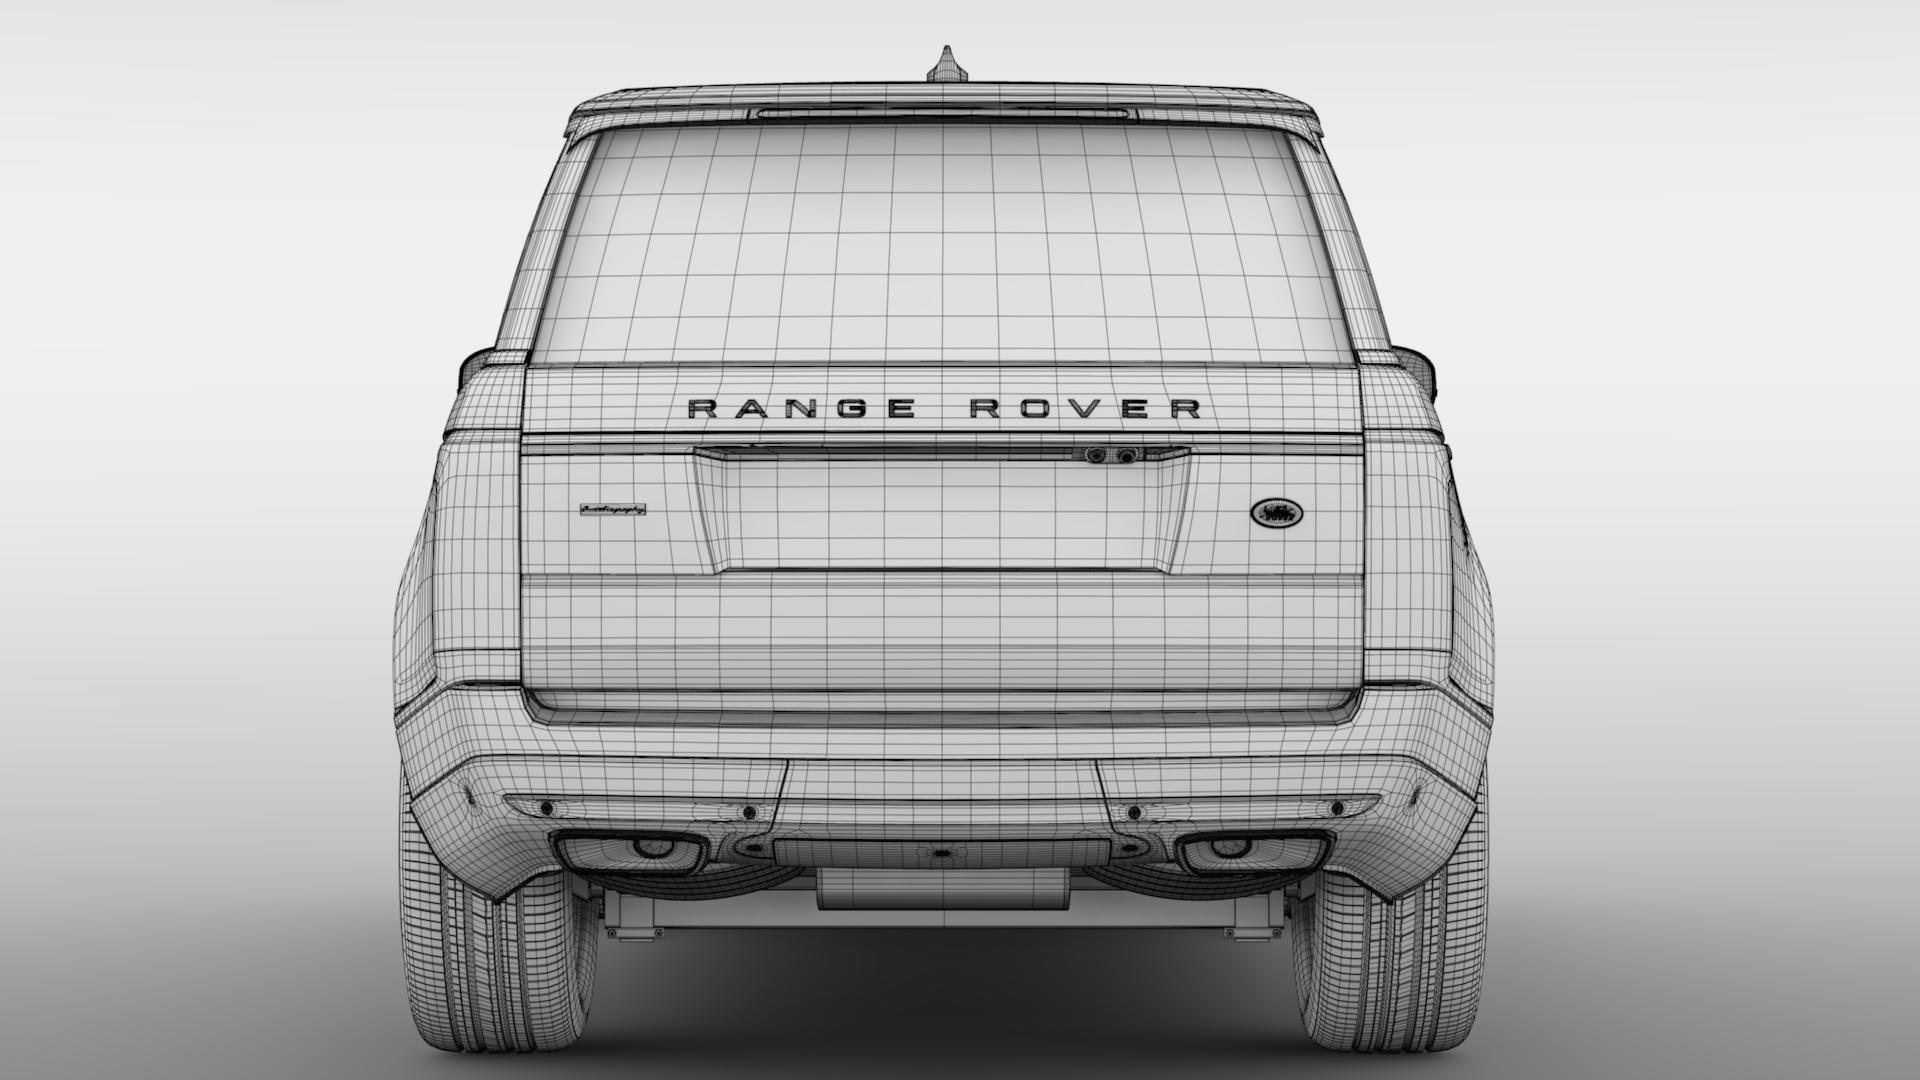 range rover autobiography hybrid lwb l405 2018 3d model max fbx c4d lwo ma mb hrc xsi obj 277312